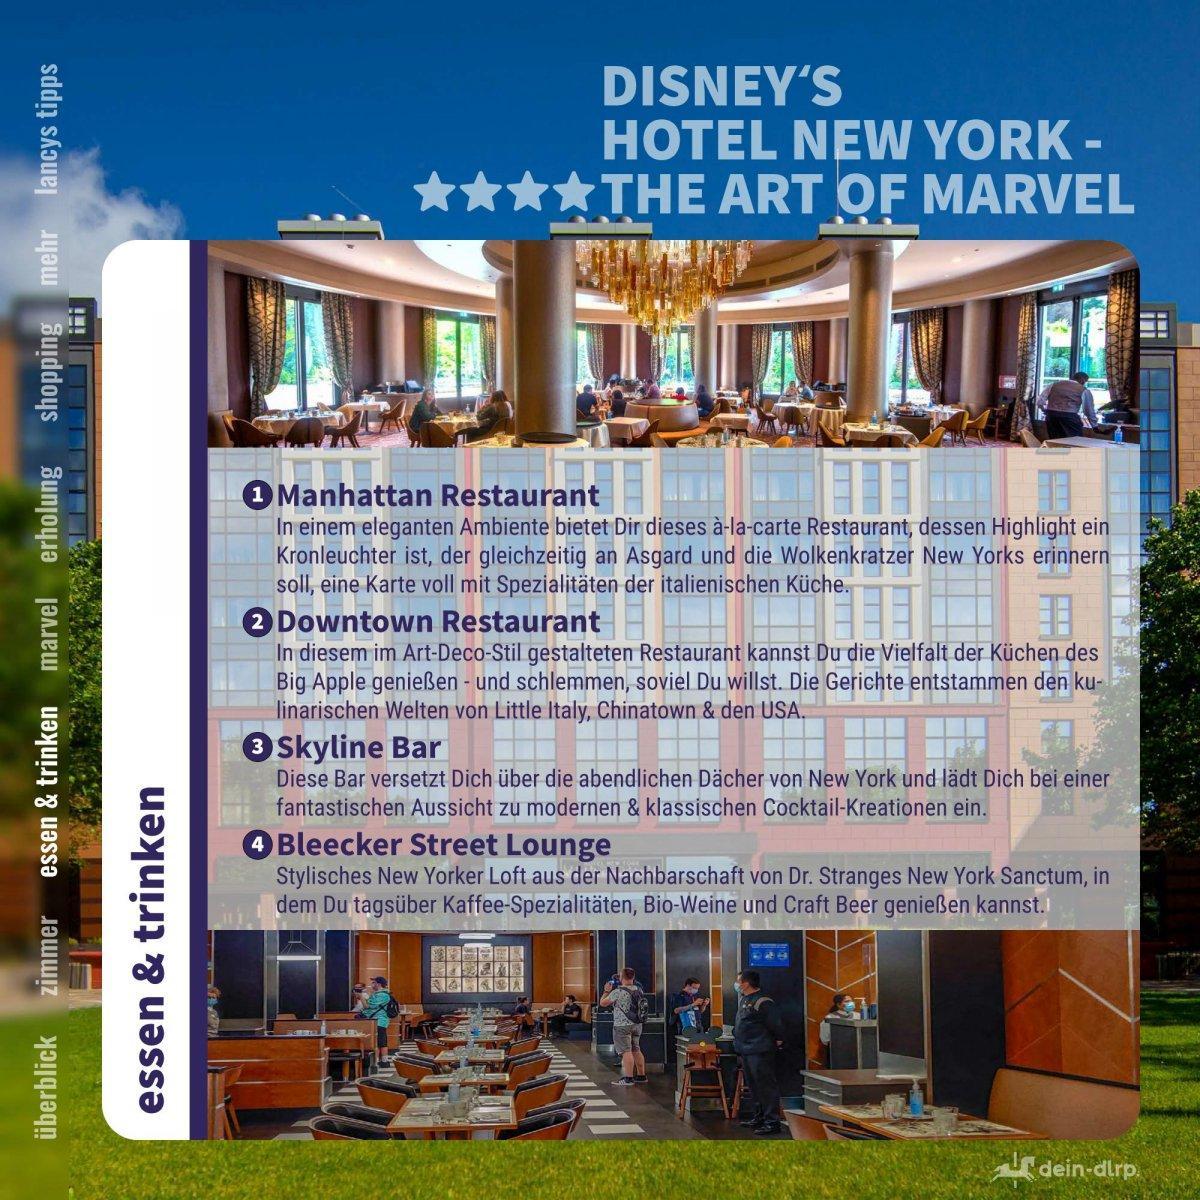 disneys-hotel-new-york-the-art-of-hotel-fuehrer_04.jpg